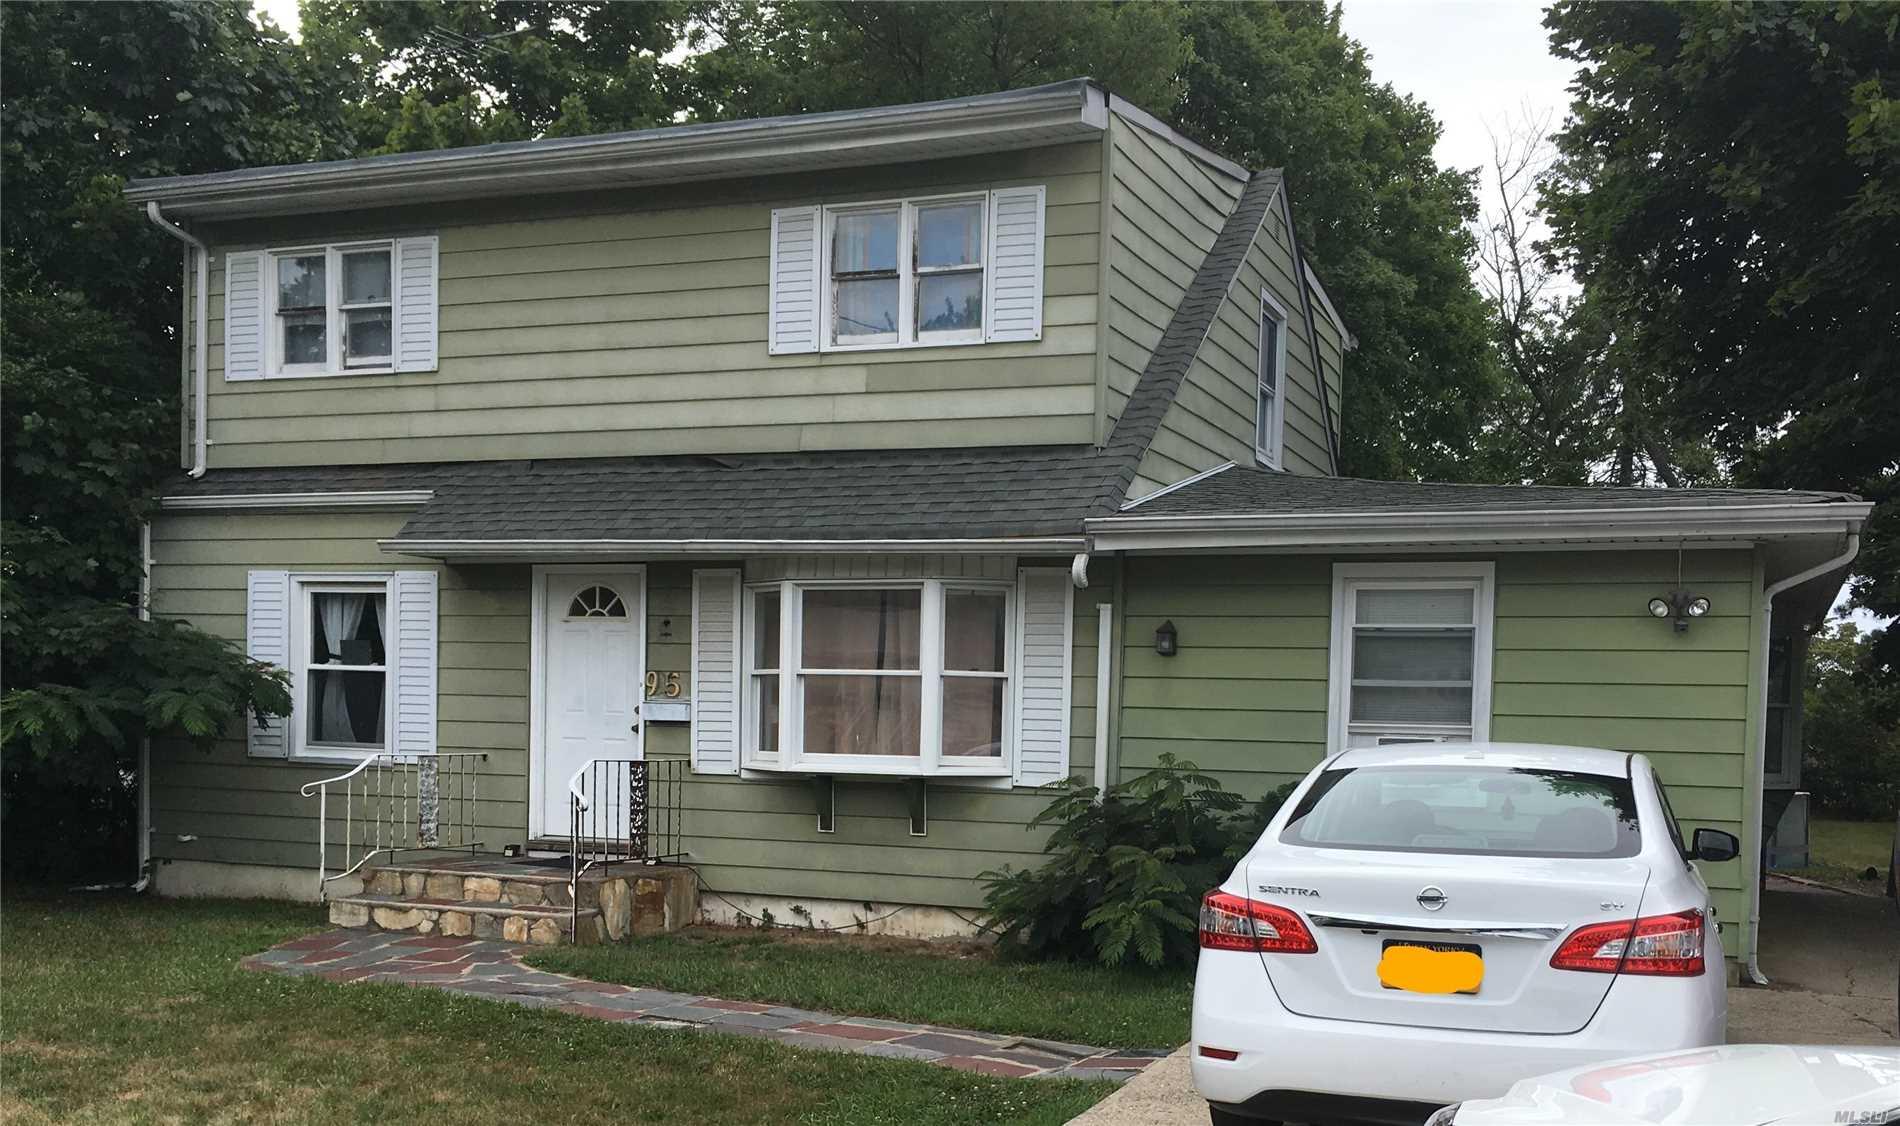 Photo of home for sale at 95 Heathcote Rd, Lindenhurst NY